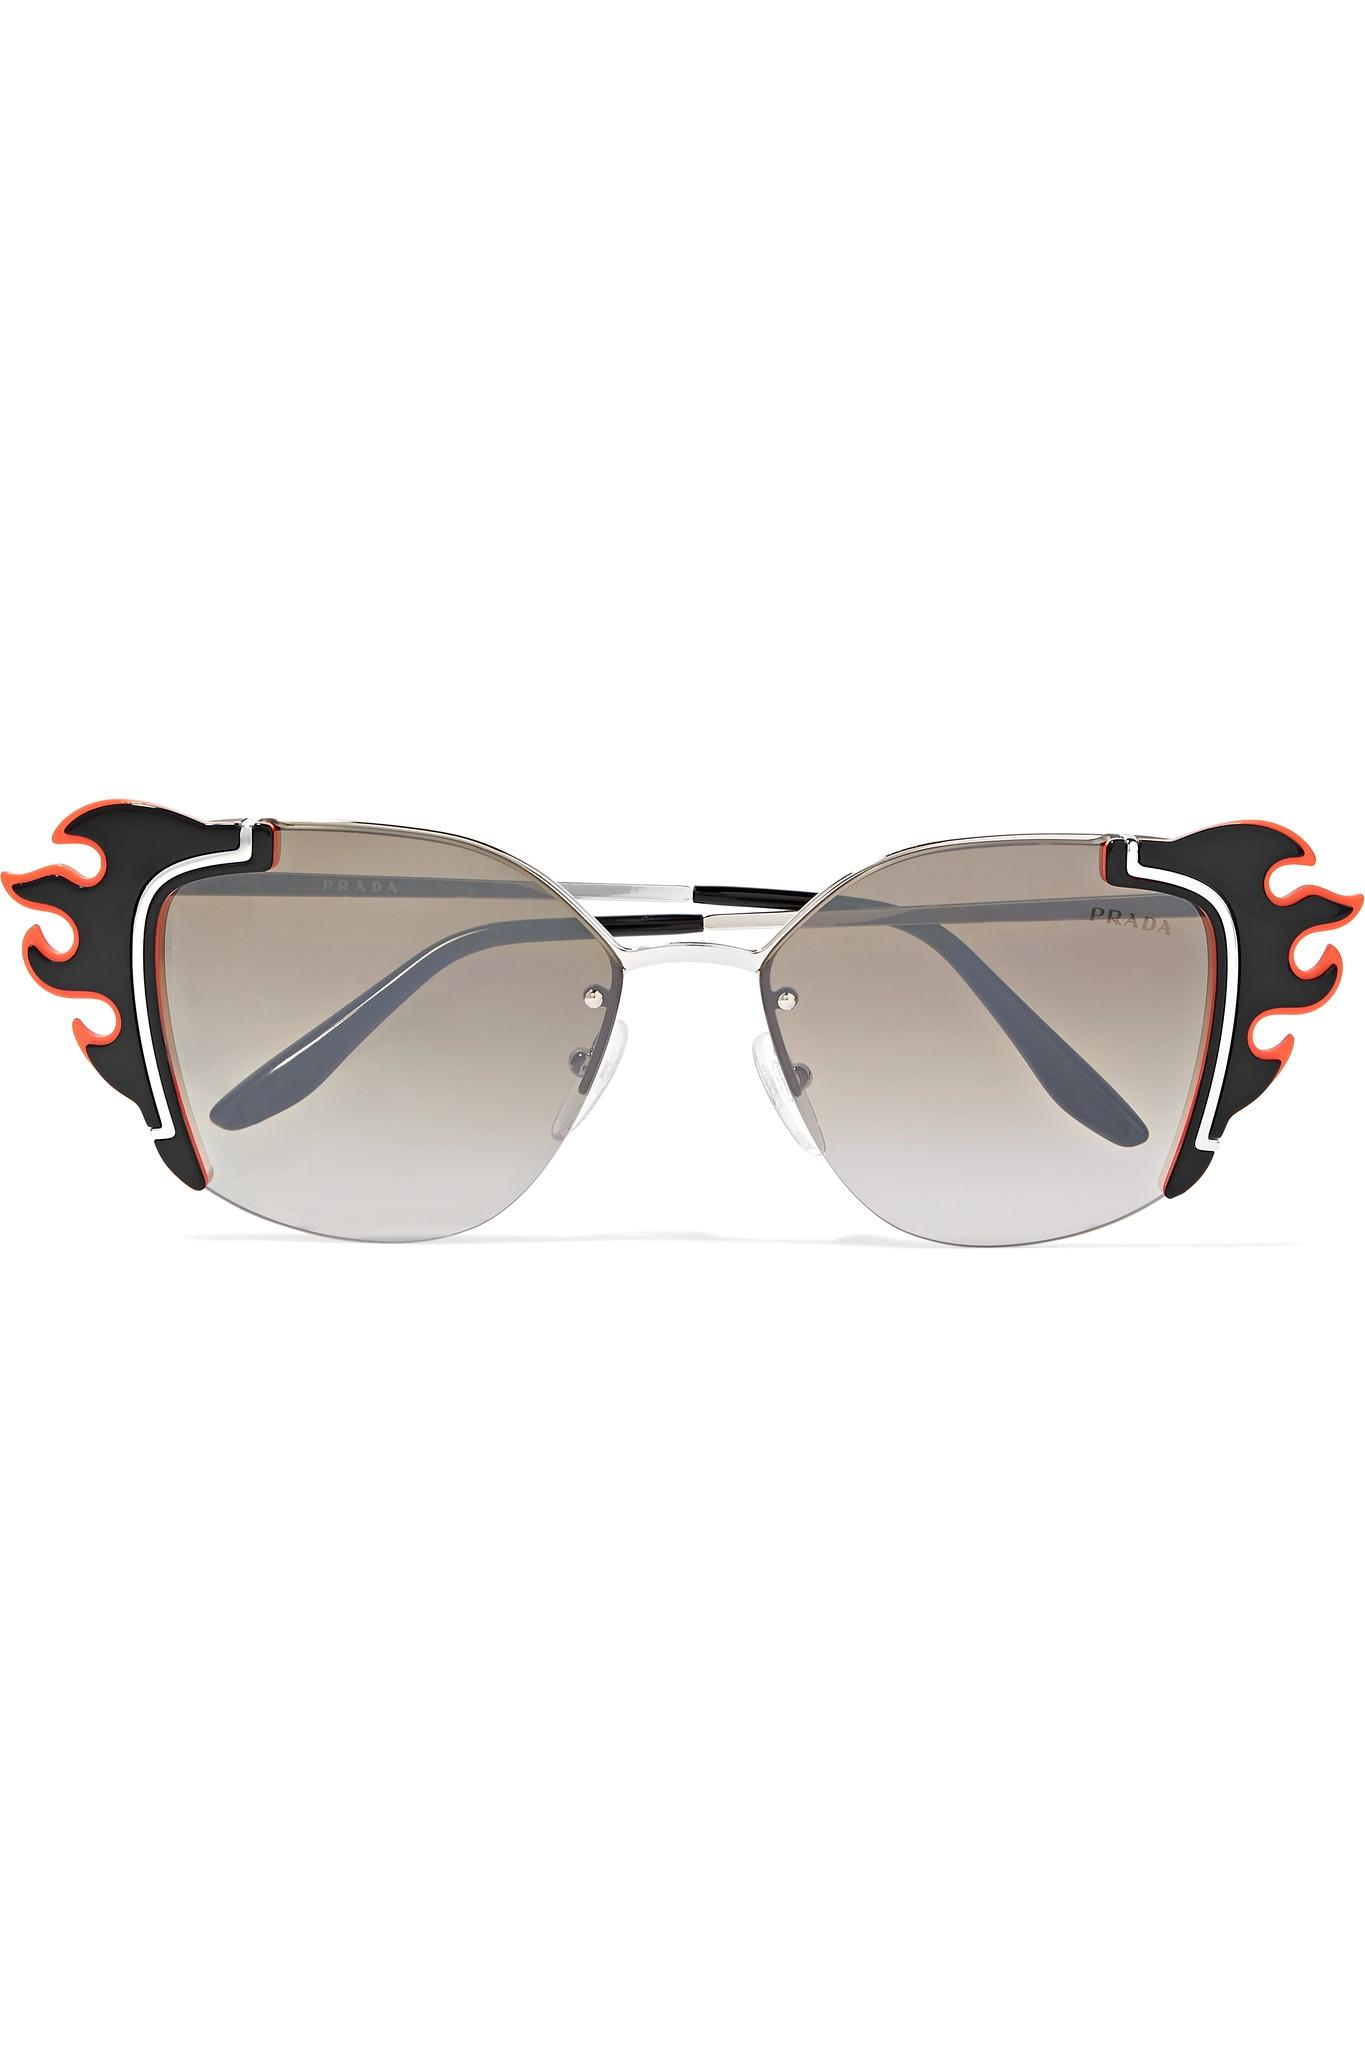 5afe56840c386 Prada Embellished Cat-eye Acetate And Silver-tone Sunglasses in ...